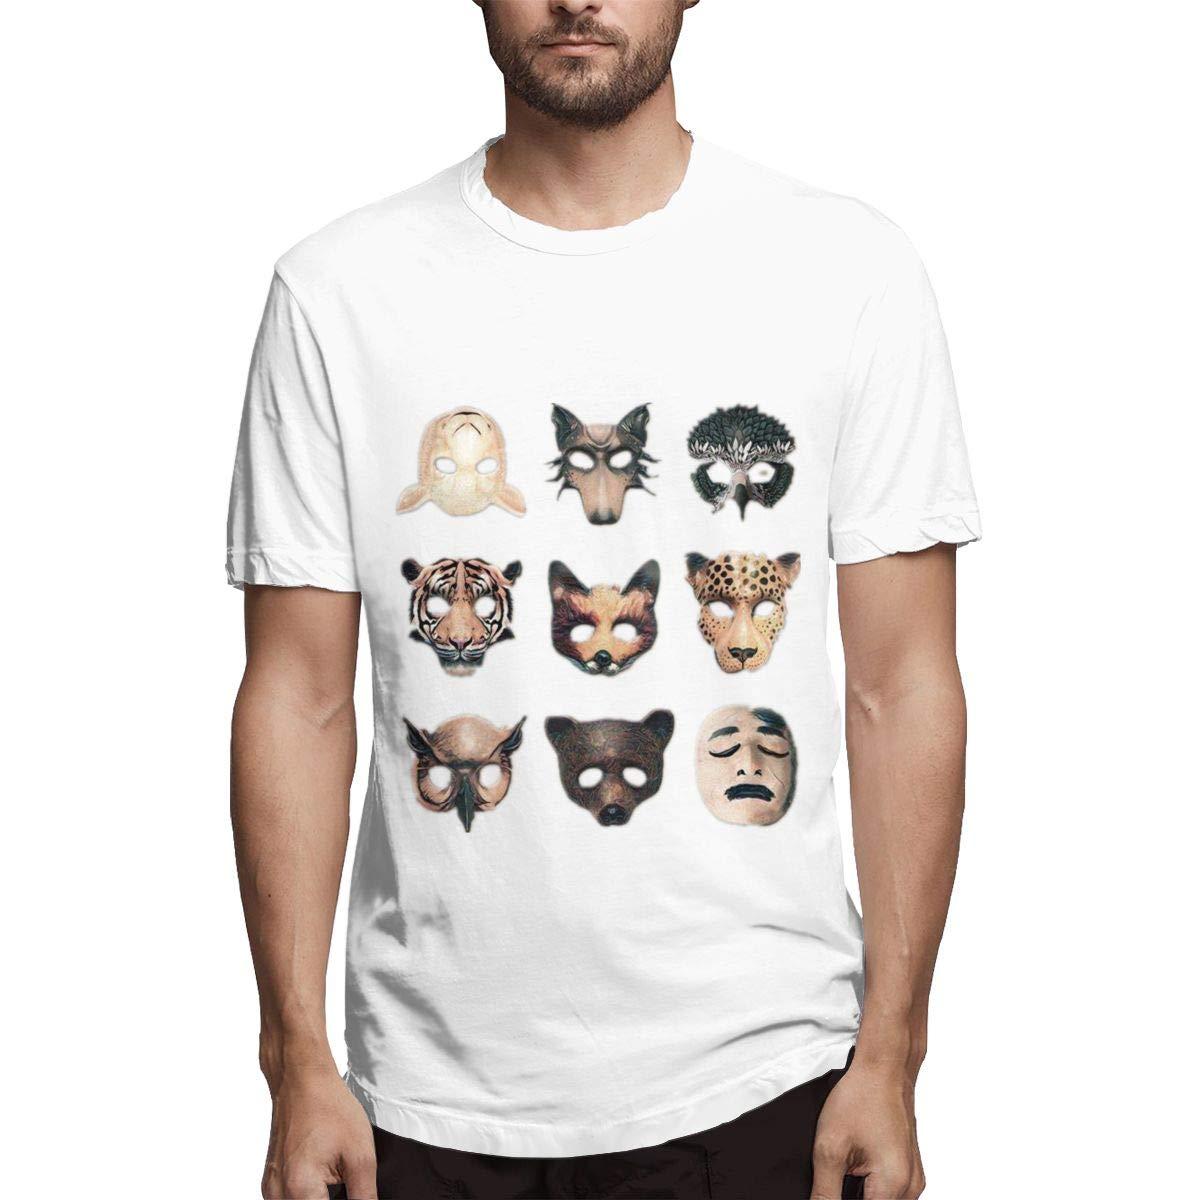 Lihehen Badflower Fashion Leisure Round Neck Tees Shirts